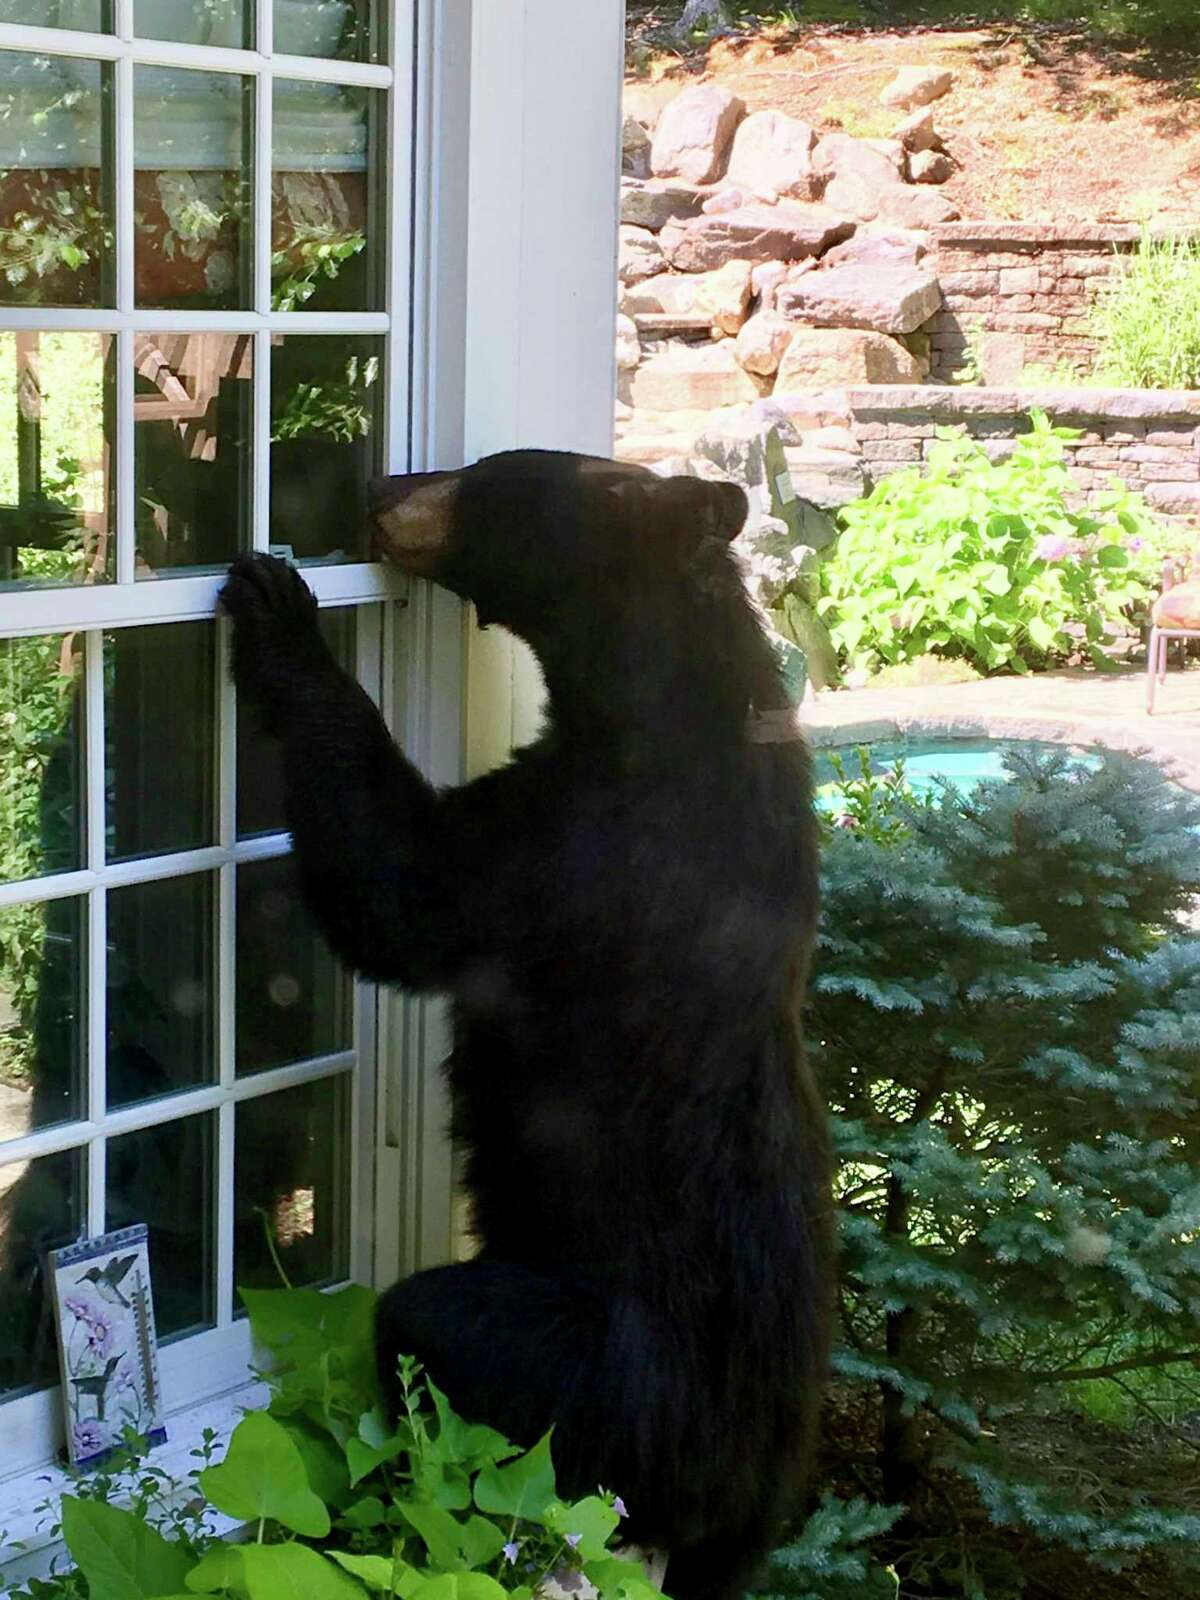 A black bear explores an Avon, Conn., backyard in this July 28, 2018, file photo.